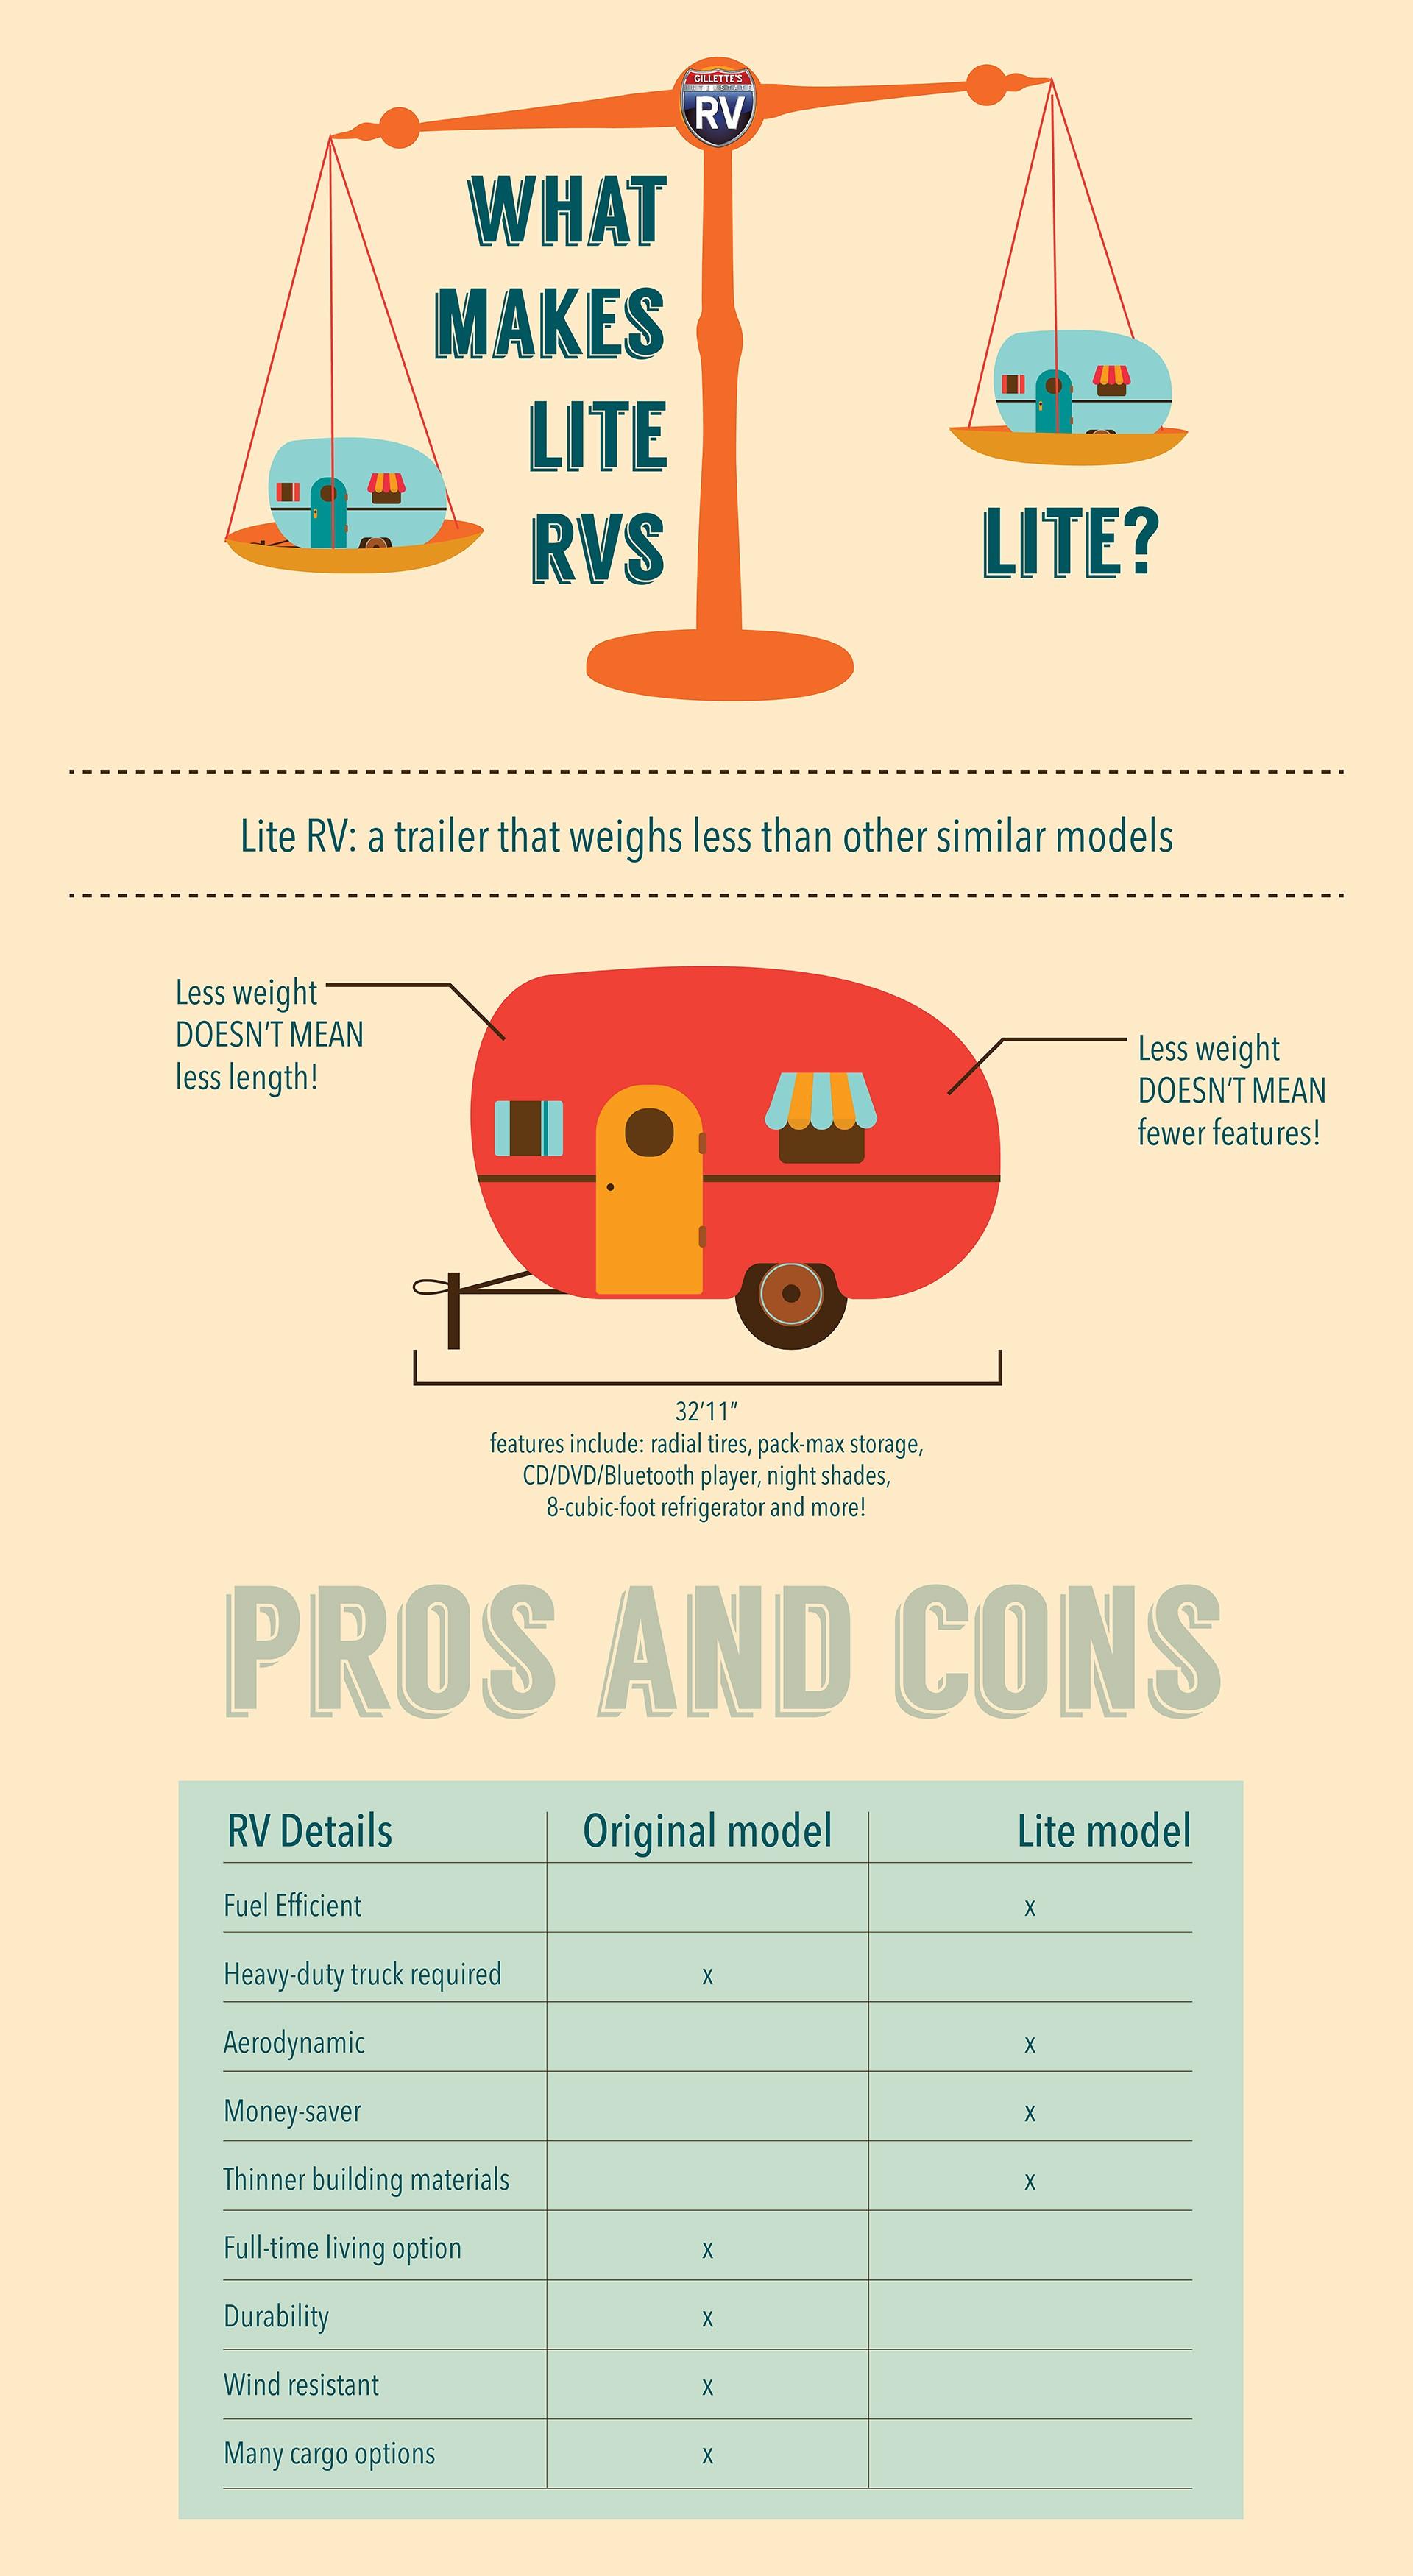 Gillette's Guide to what makes a Lite RV, Lite.